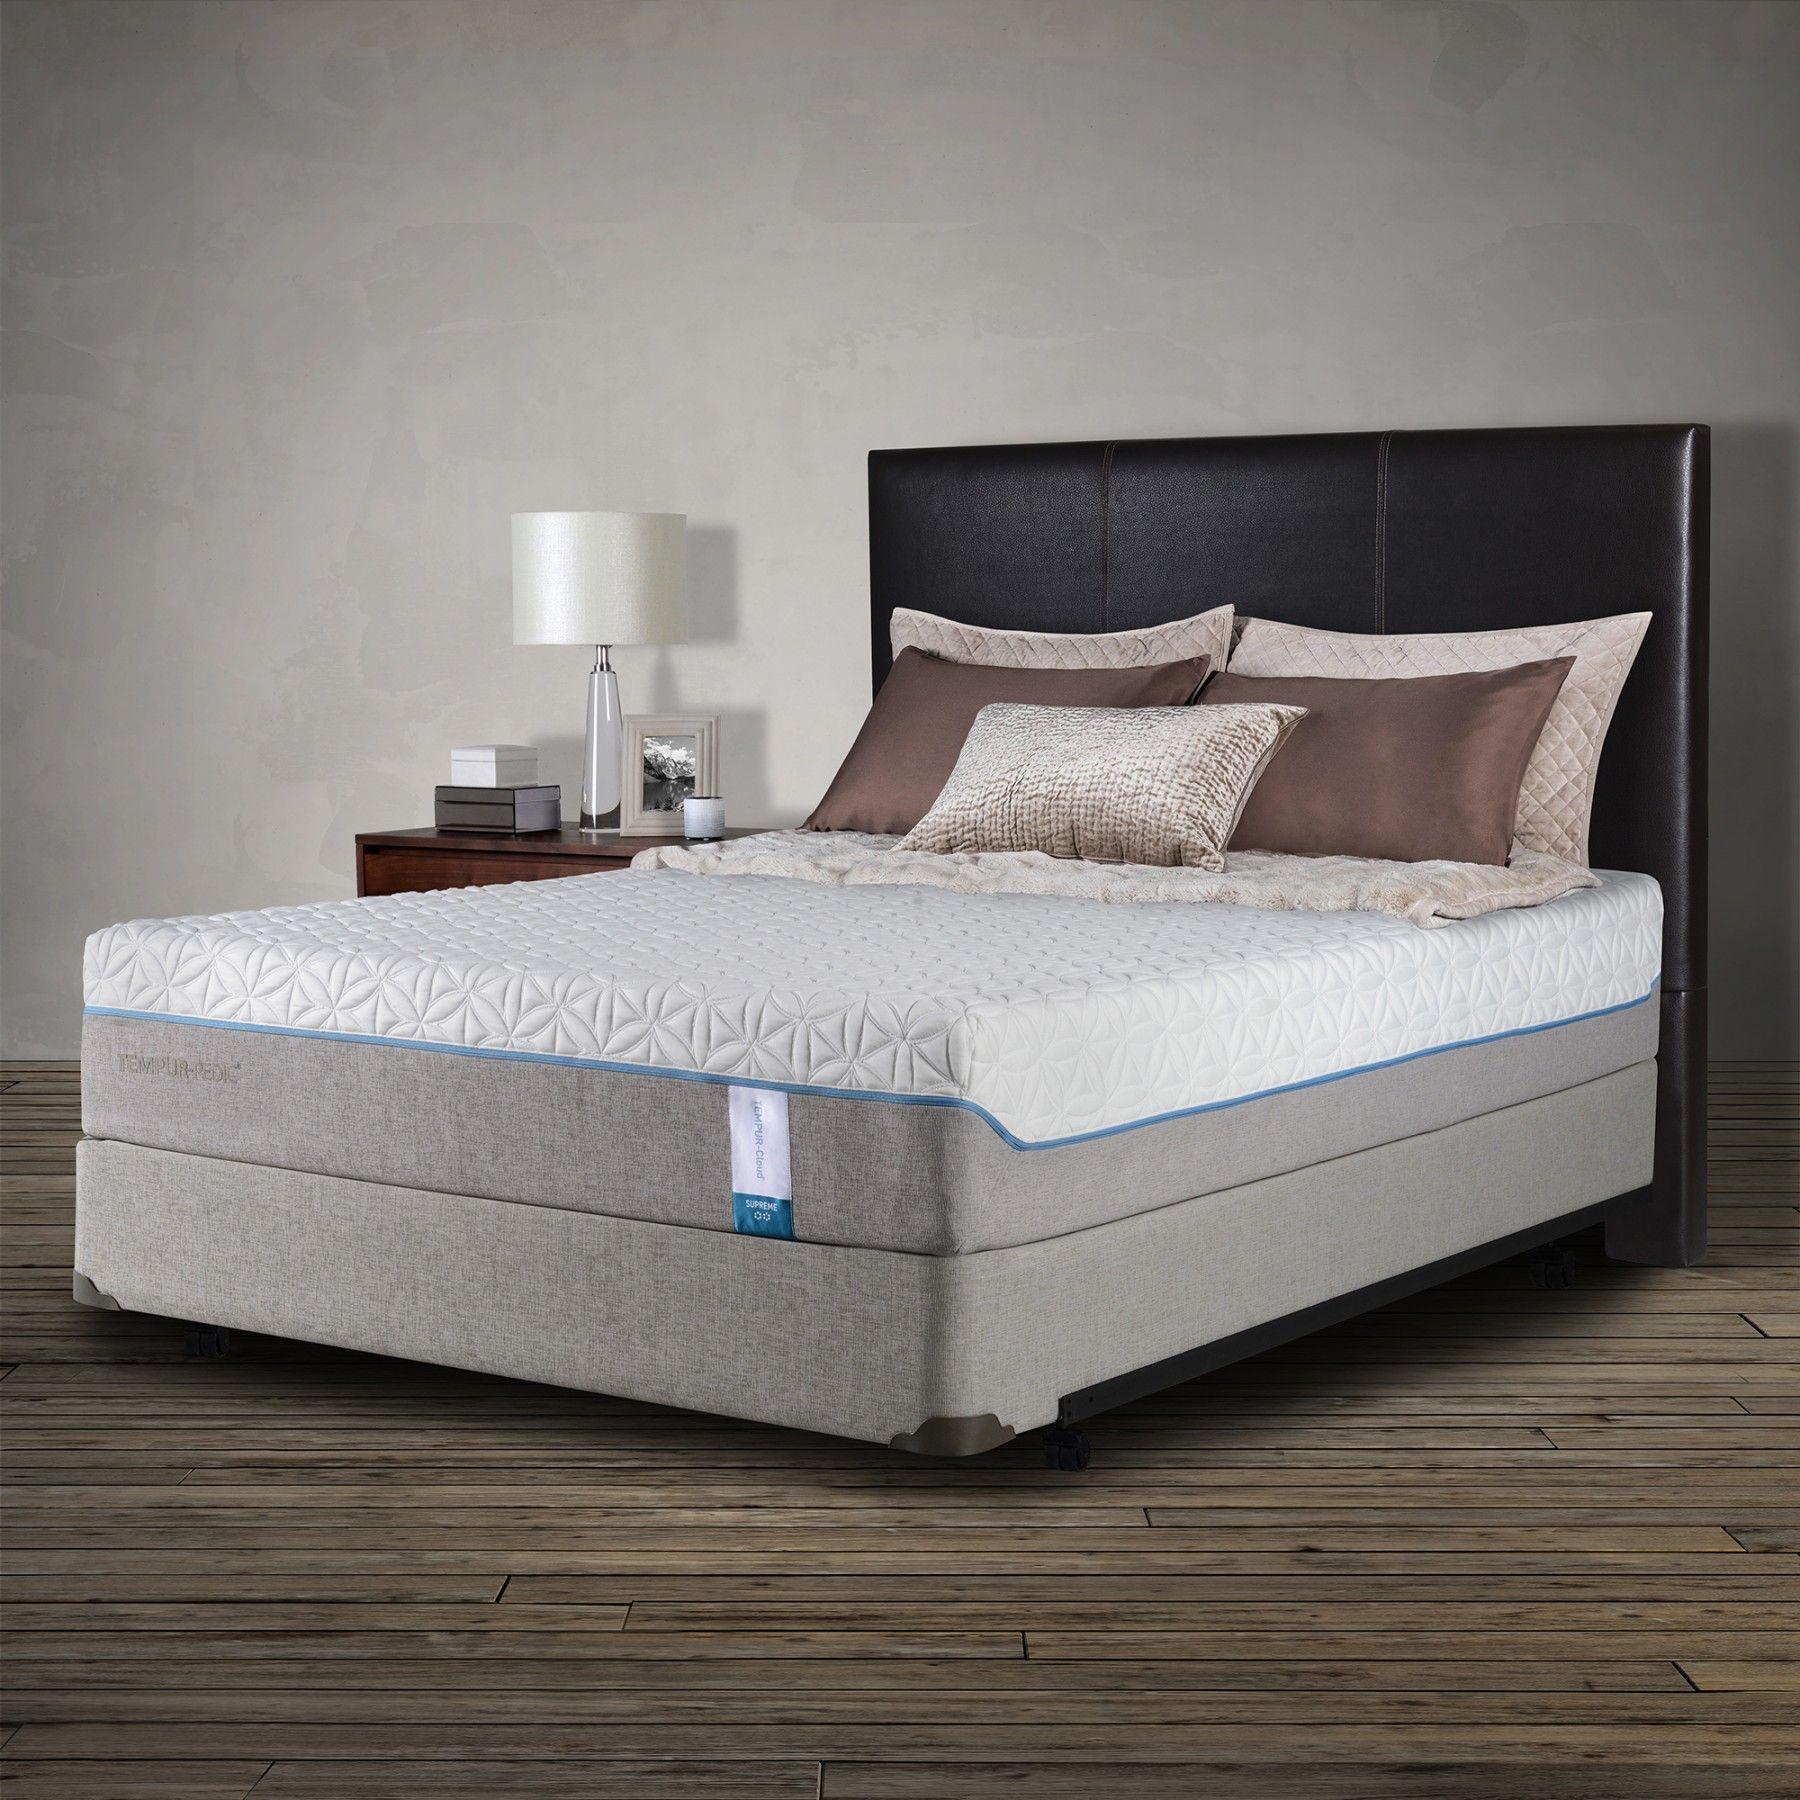 Tempur Pedic Twin Bett Plattform Bett Rahmen Keine Box Spring Ikea